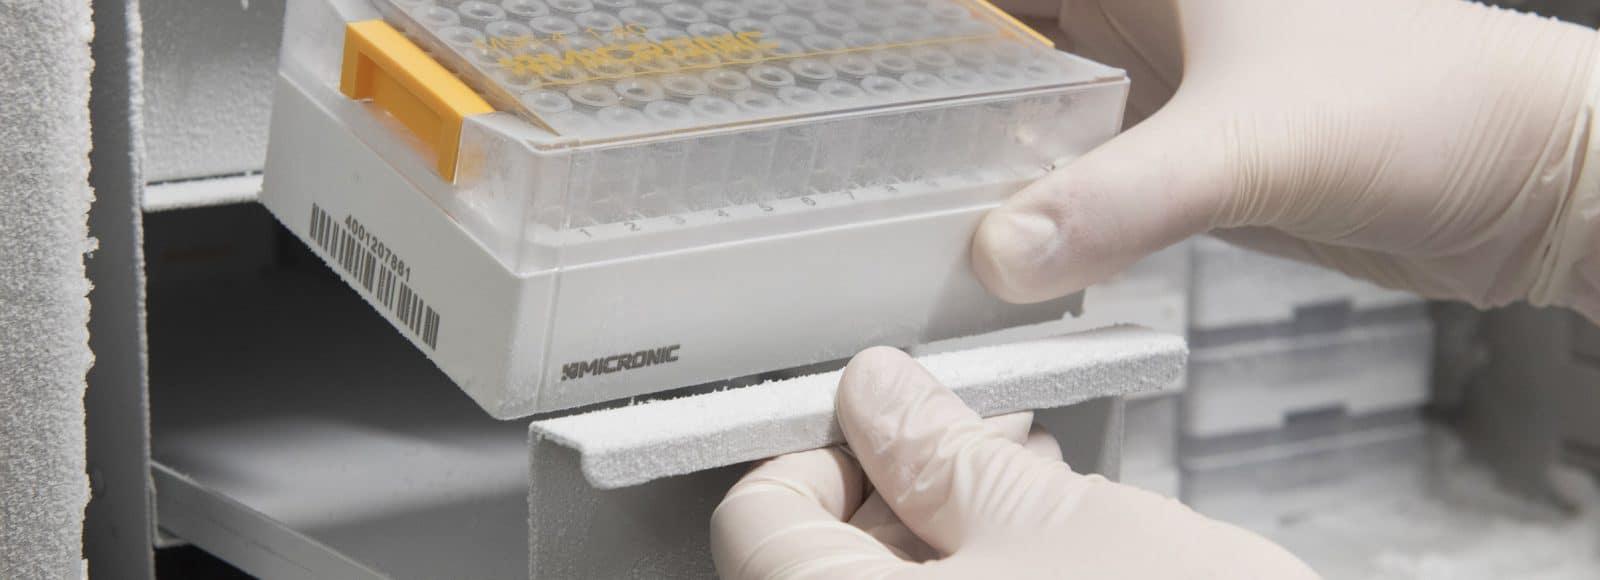 NEW Micronic in -80C freezer (2407x1607)